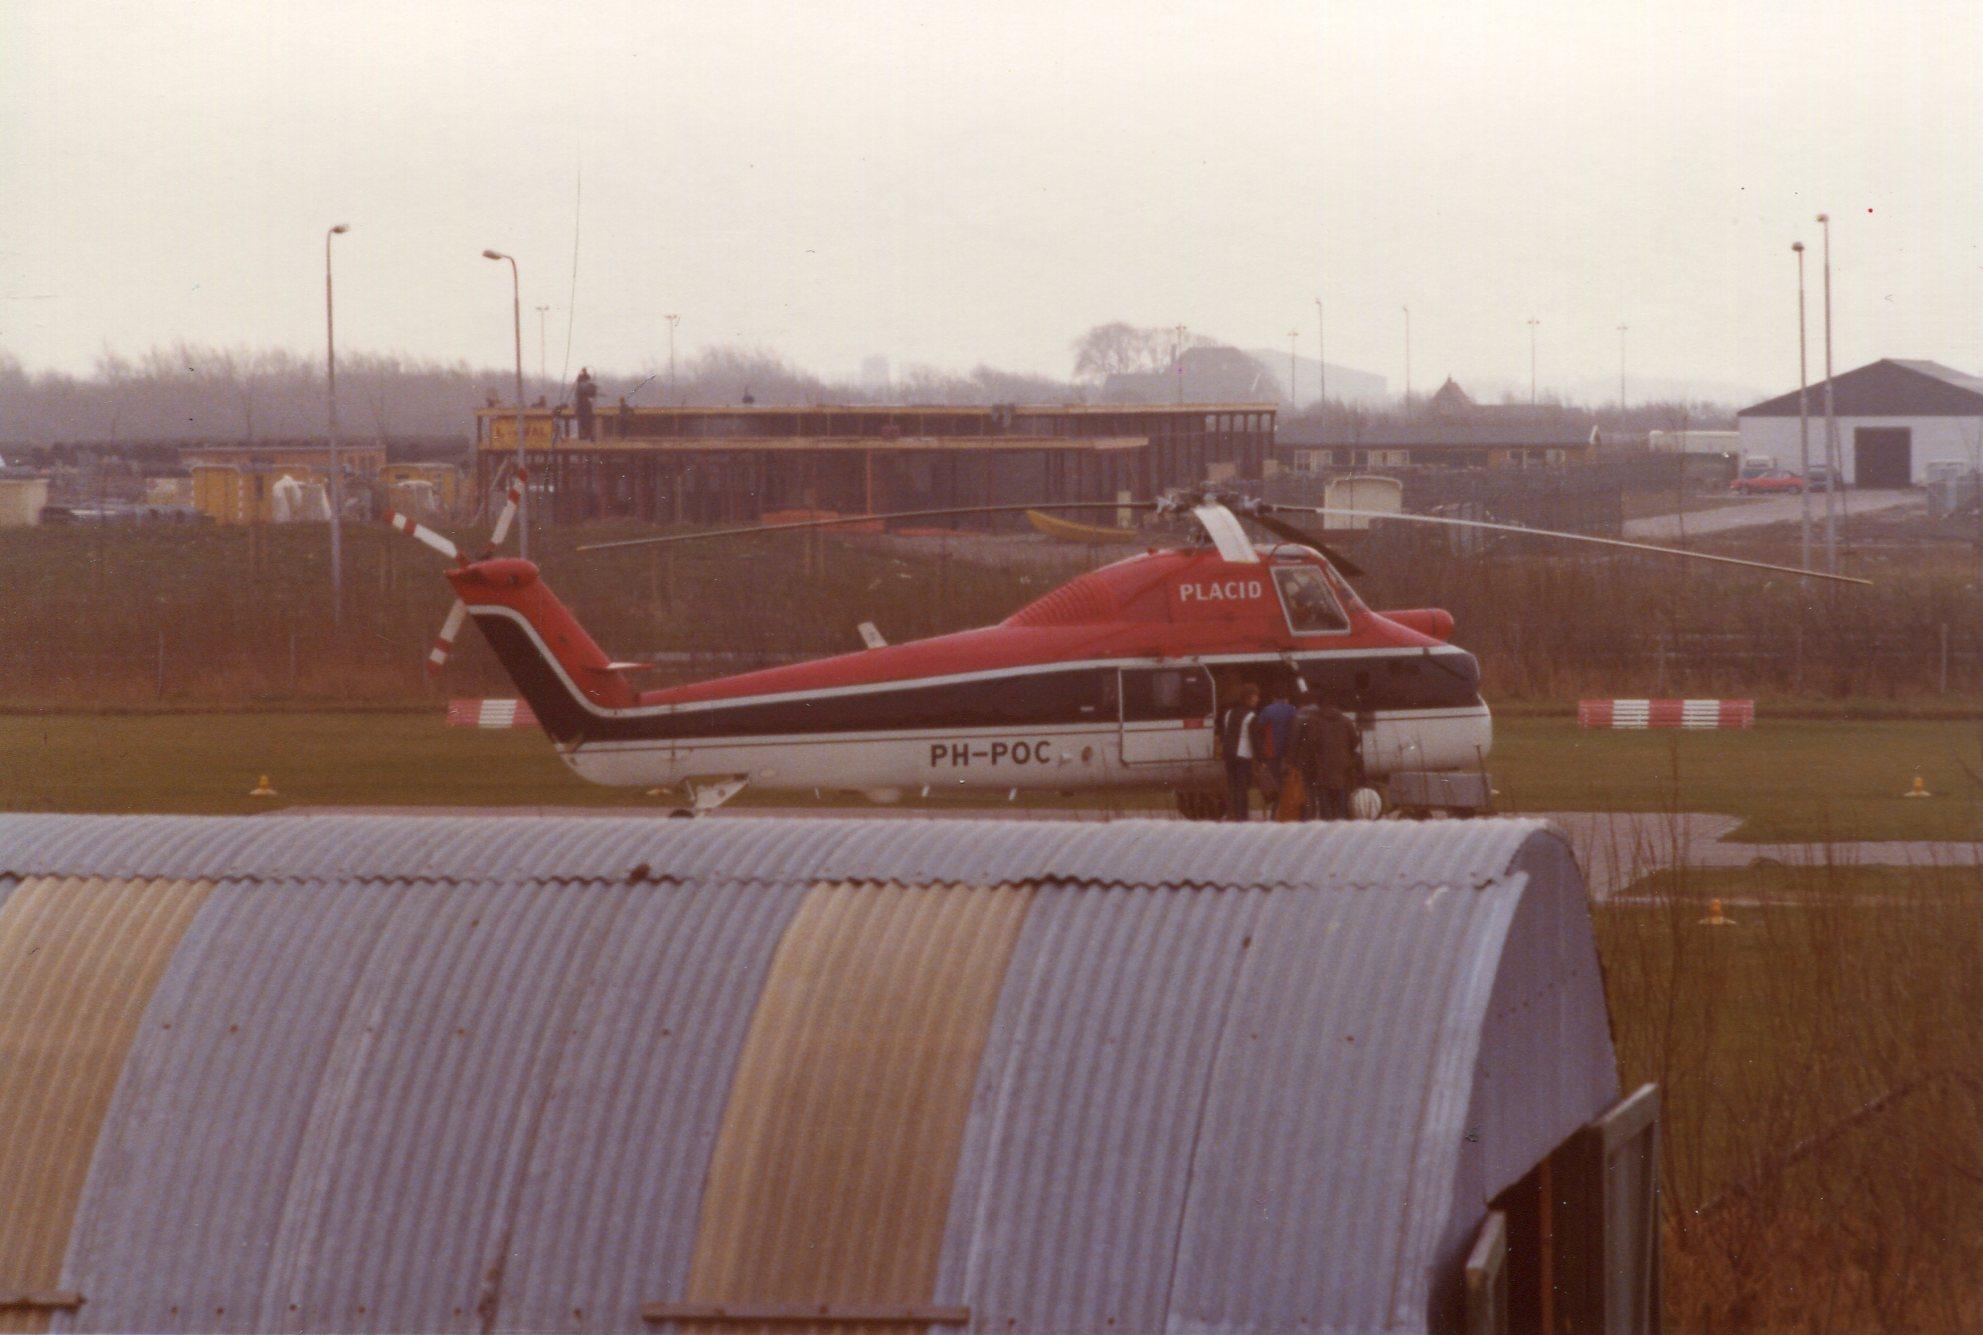 Naam: Den Helder , april 1977 (2).jpg Bekeken: 219 Grootte: 271,9 KB